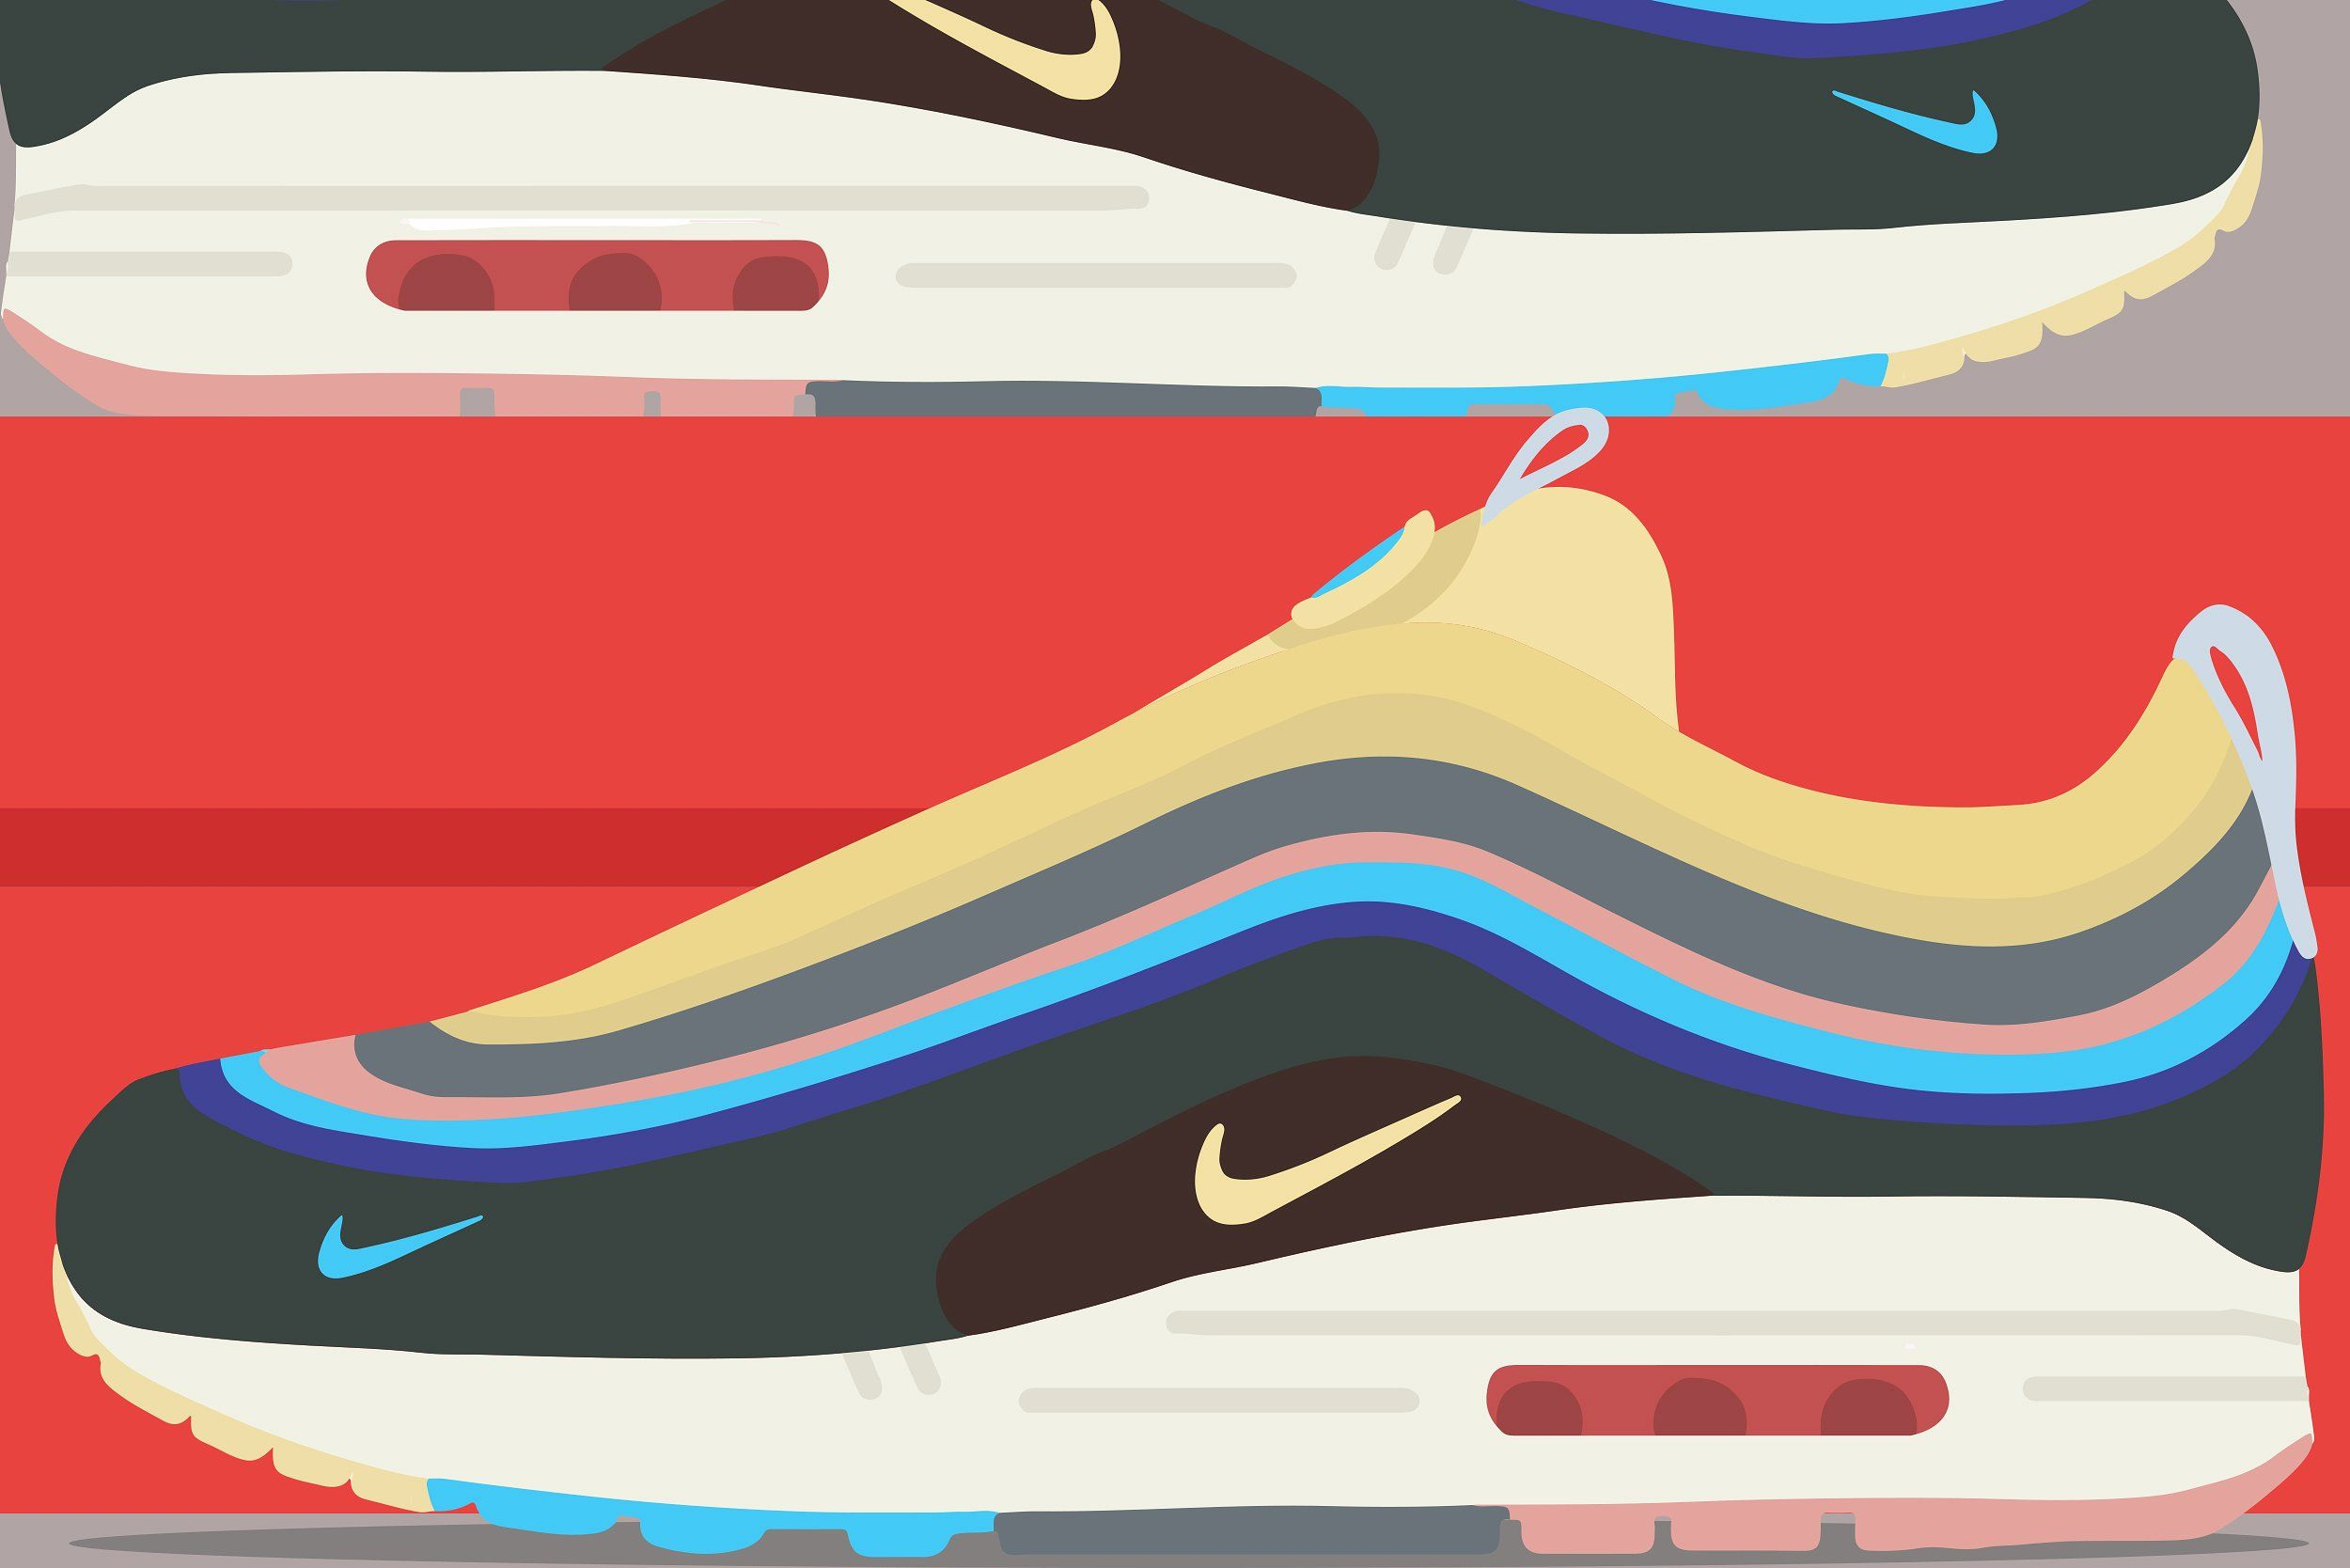 Nike Air Max 97 1 Max Air Wotherspoon Sean Air Max 97 Sneakers Illustration Nike Air Max 97